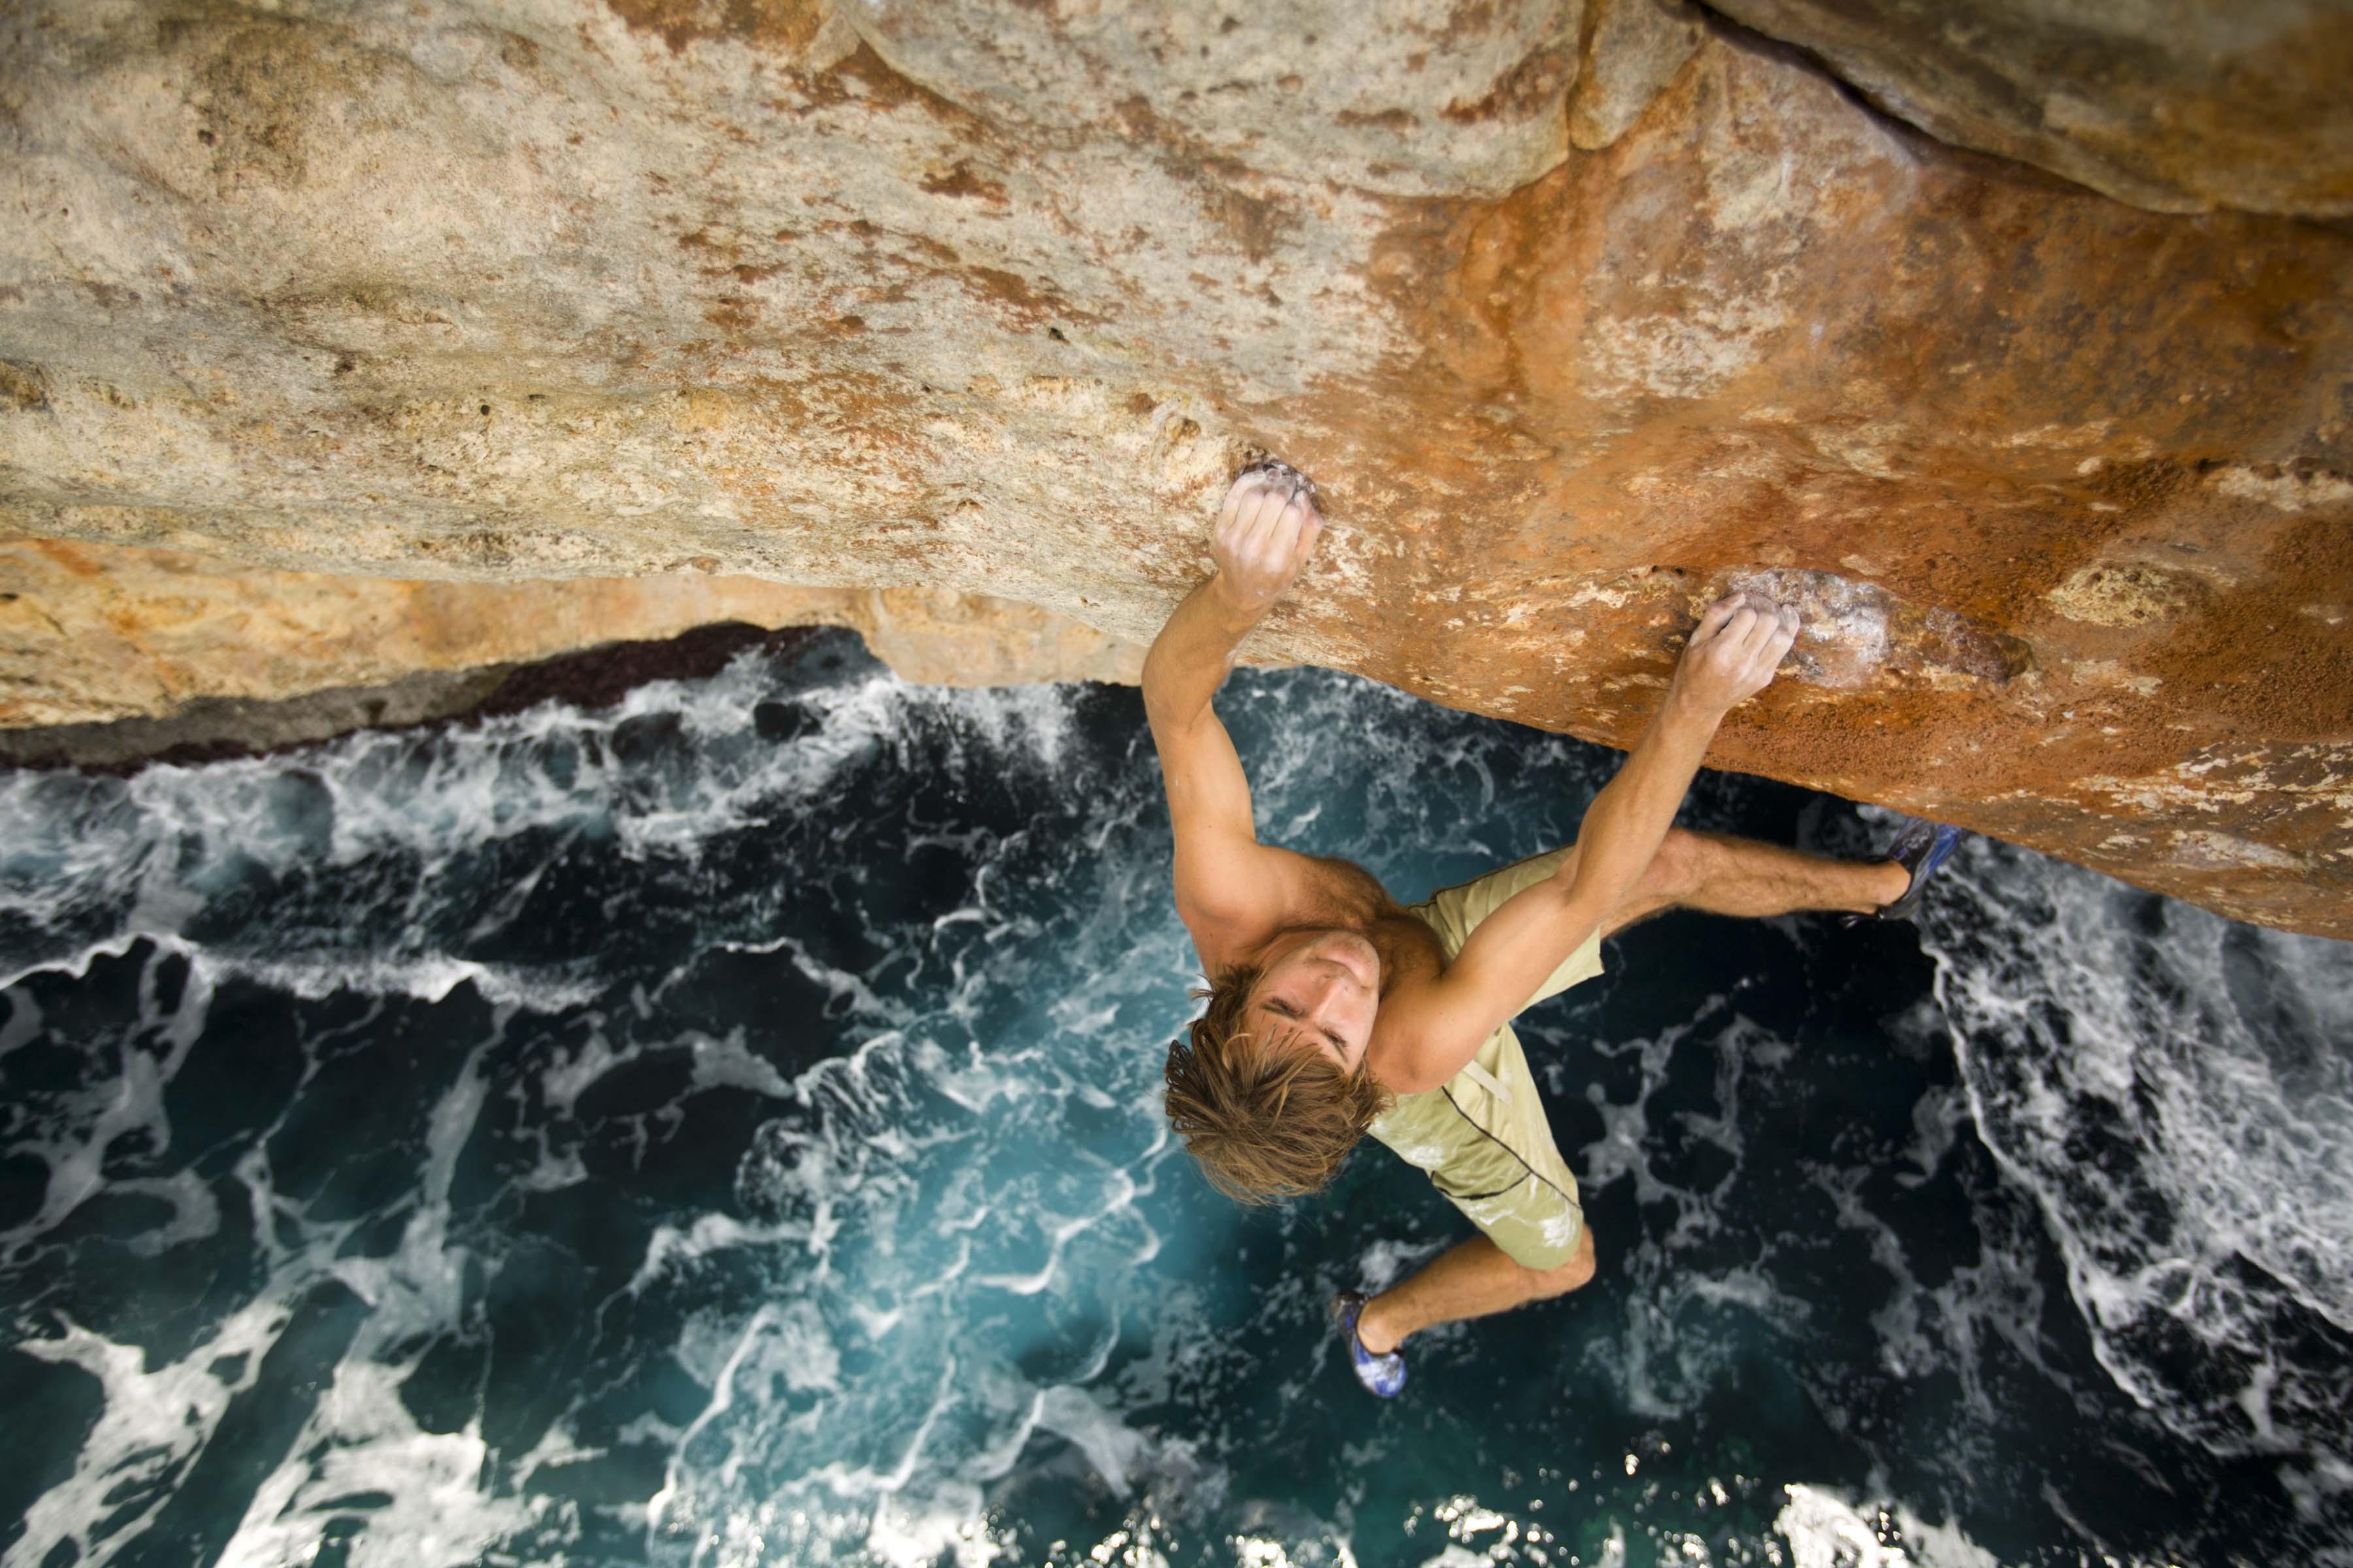 Chris Sharma rock climbing deep water soloing in Mallorca Spain 3601x2400